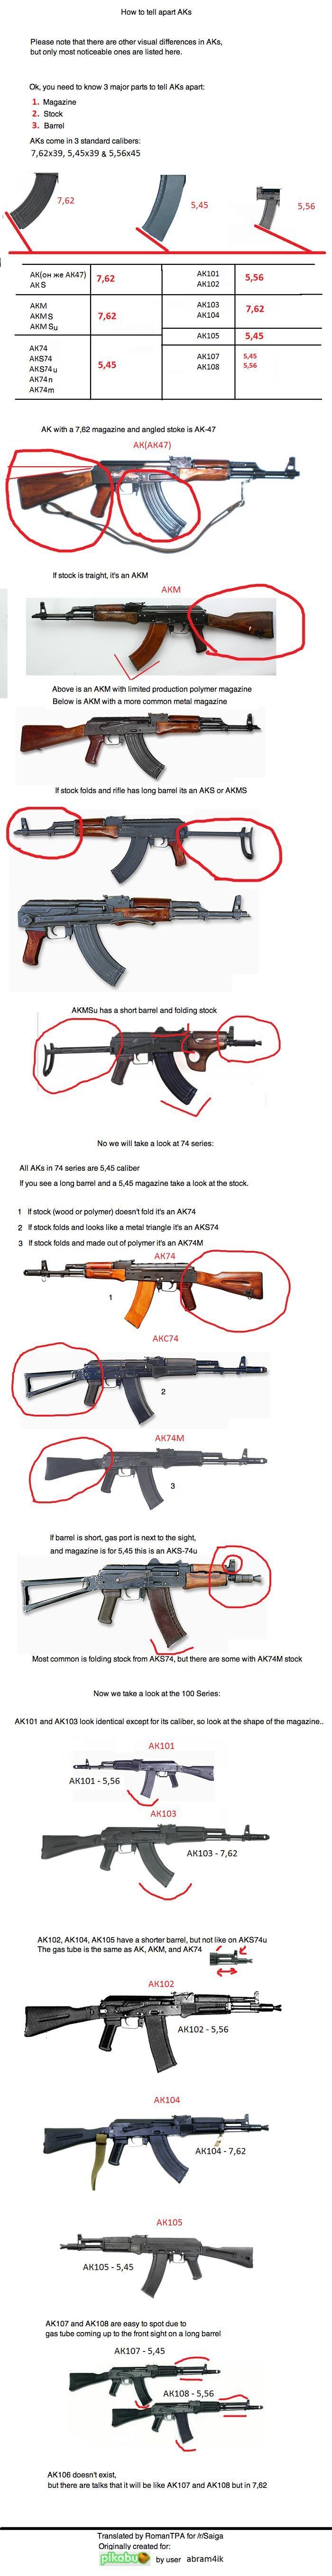 AK Модификации автомата Калашникова